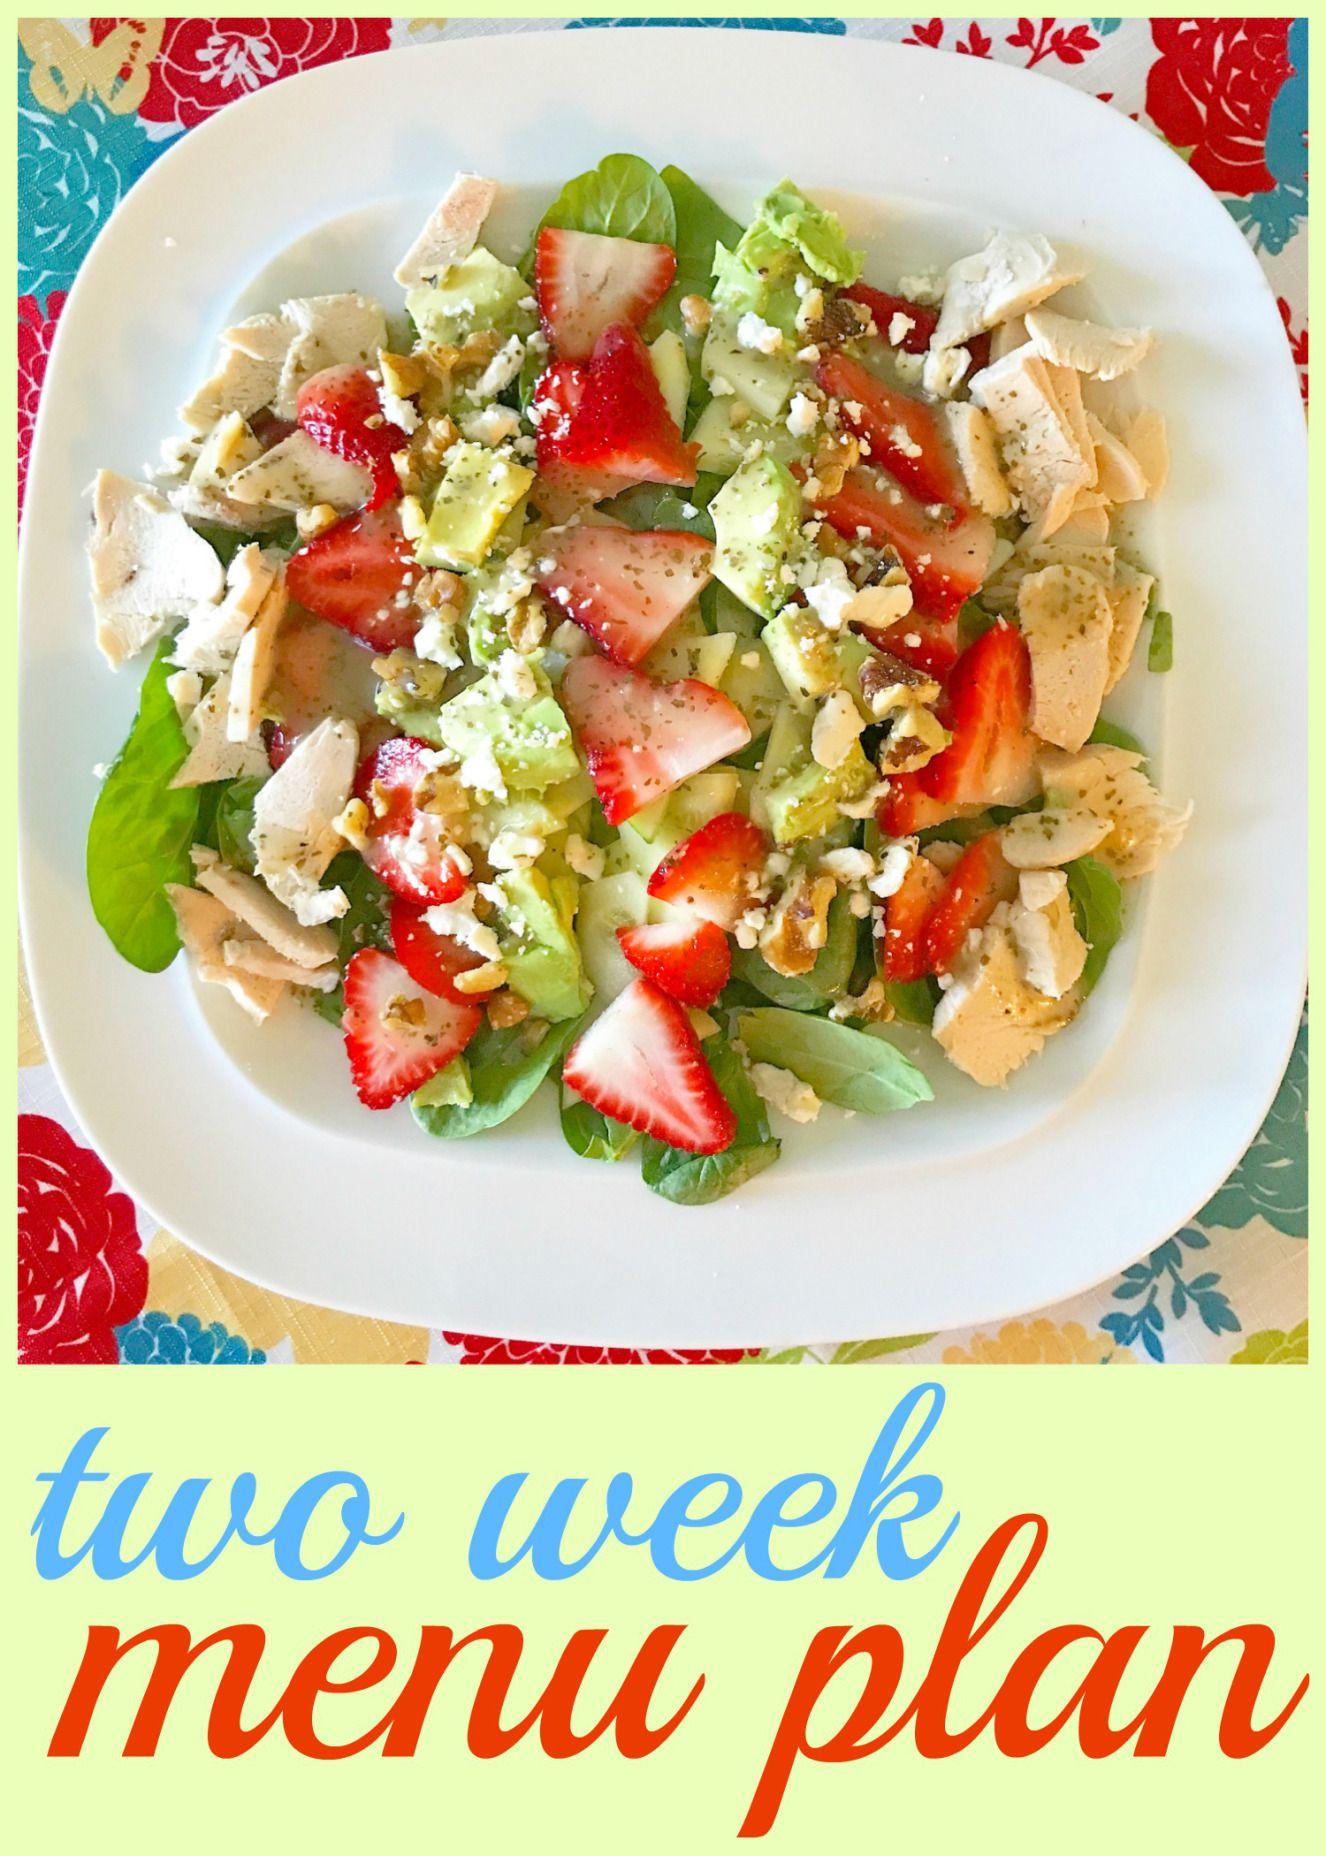 TwoWeek Menu Plan {Menu Monday} Cooking on a budget